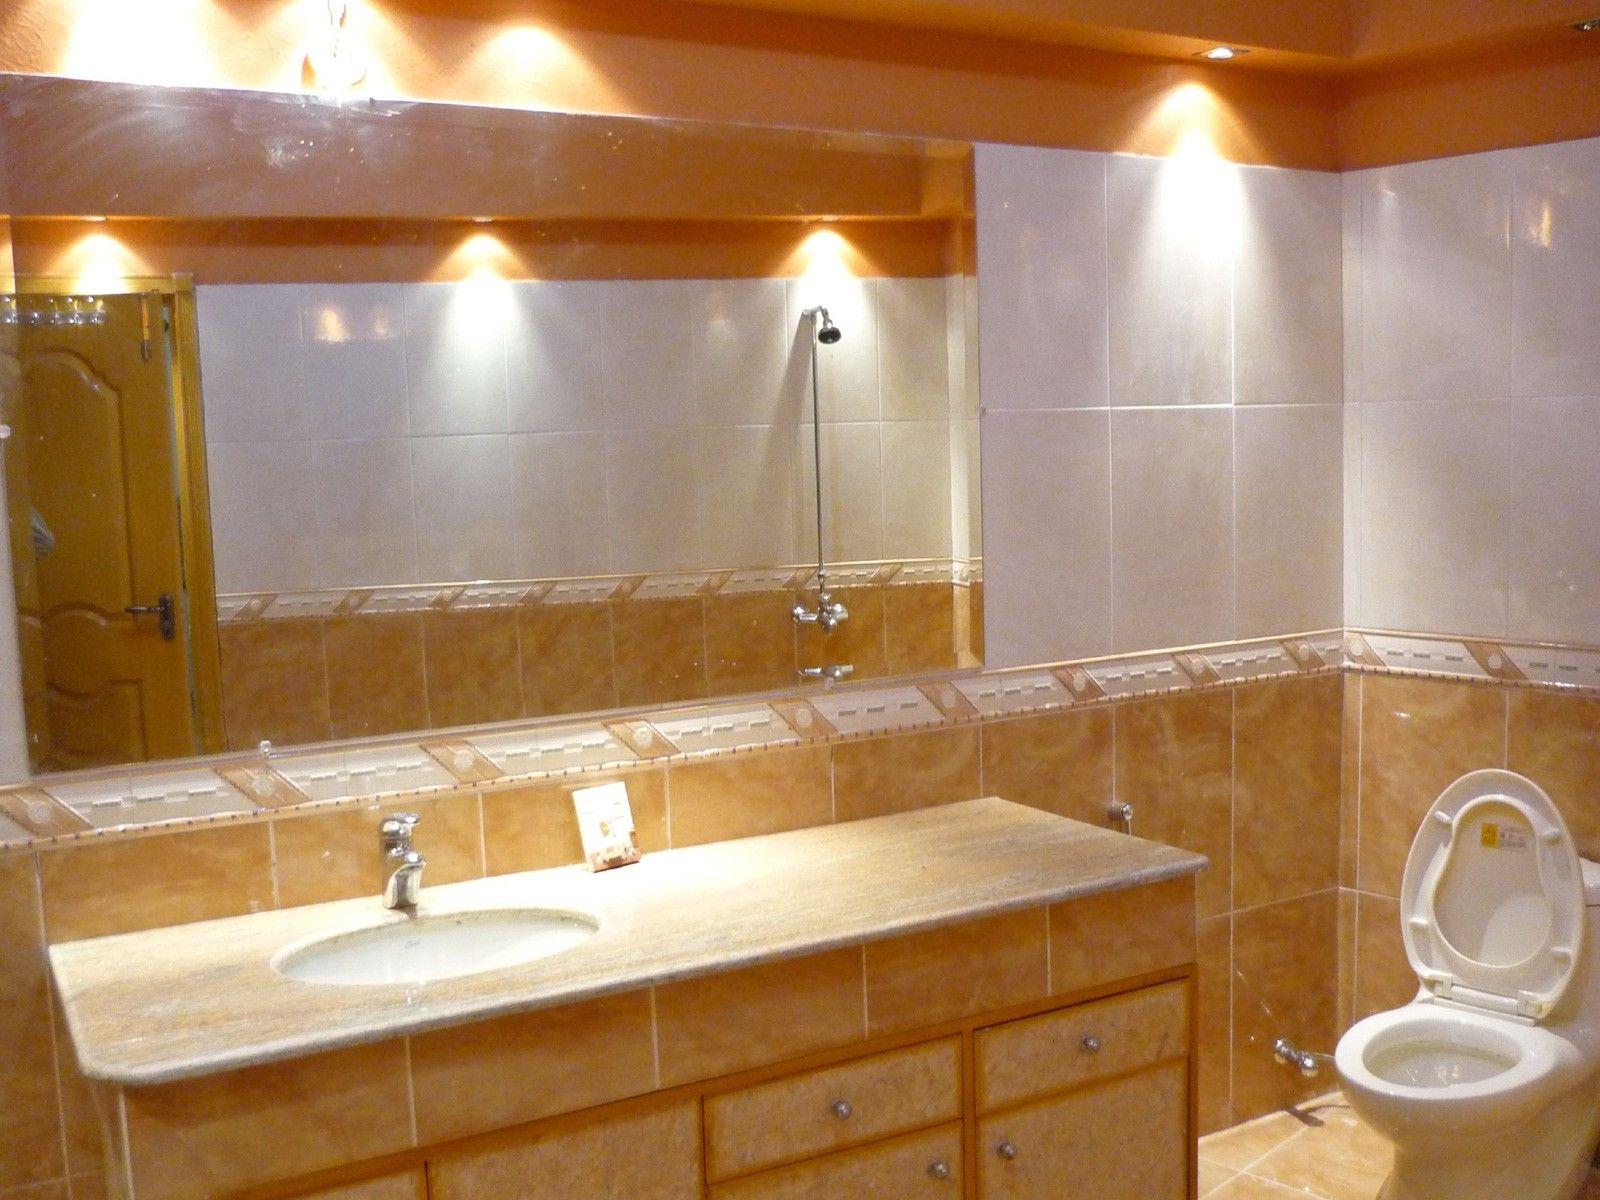 Antique Brass Light Fixtures For Bathroom House Interior Design - Antique brass bathroom light fixtures for bathroom decor ideas